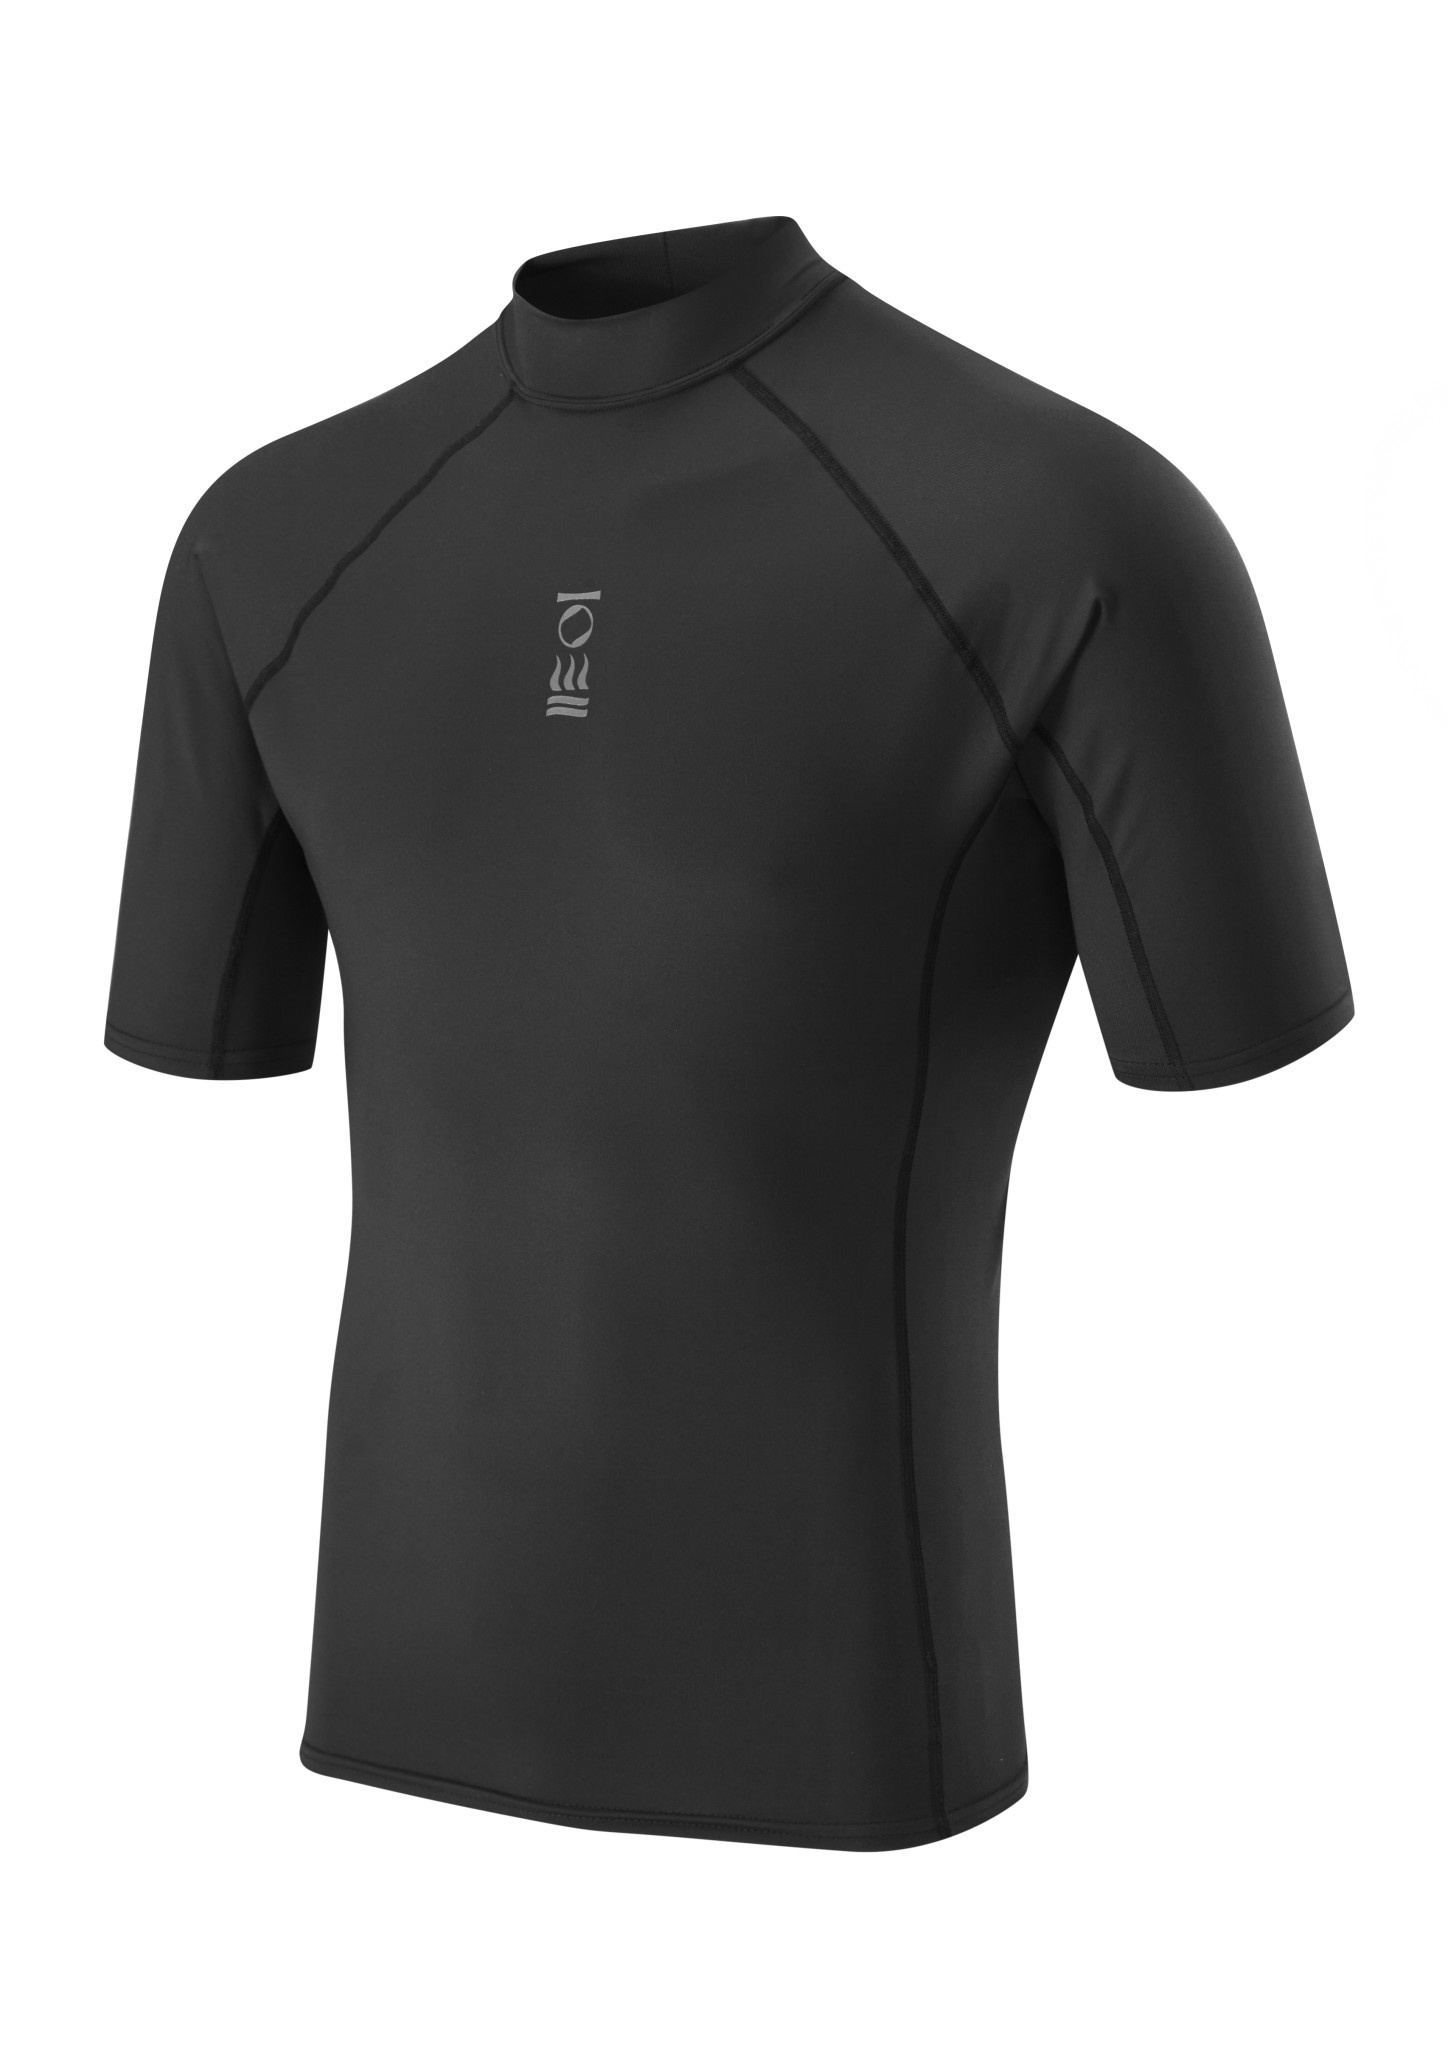 Men's Short Sleeve Hydro Skin-1